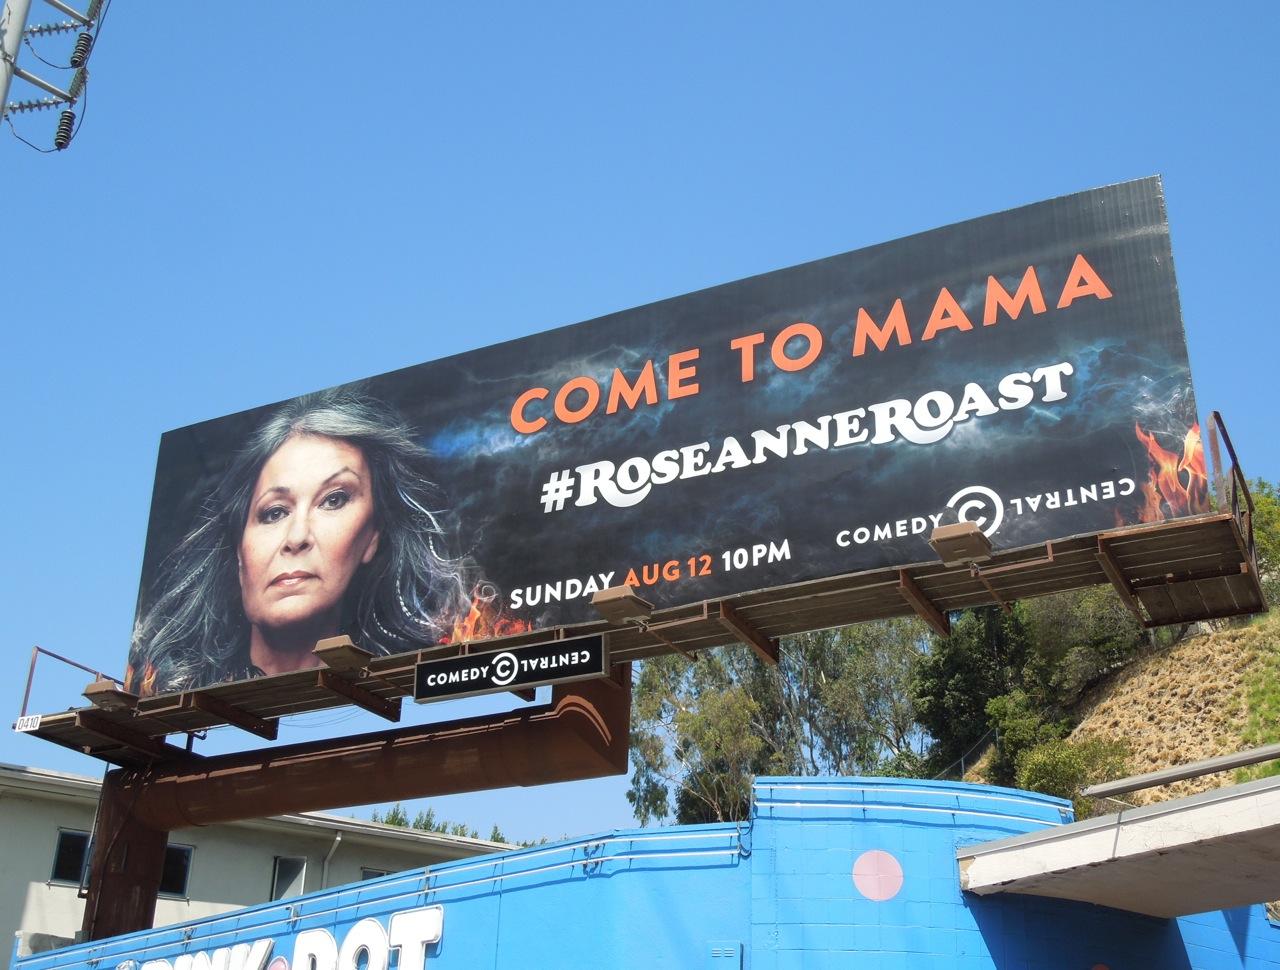 http://4.bp.blogspot.com/-Ri_n0fiRx10/UBnkr7oyz4I/AAAAAAAAvAc/Wth8XPUrevs/s1600/Roseanne+Roast+billboard.jpg